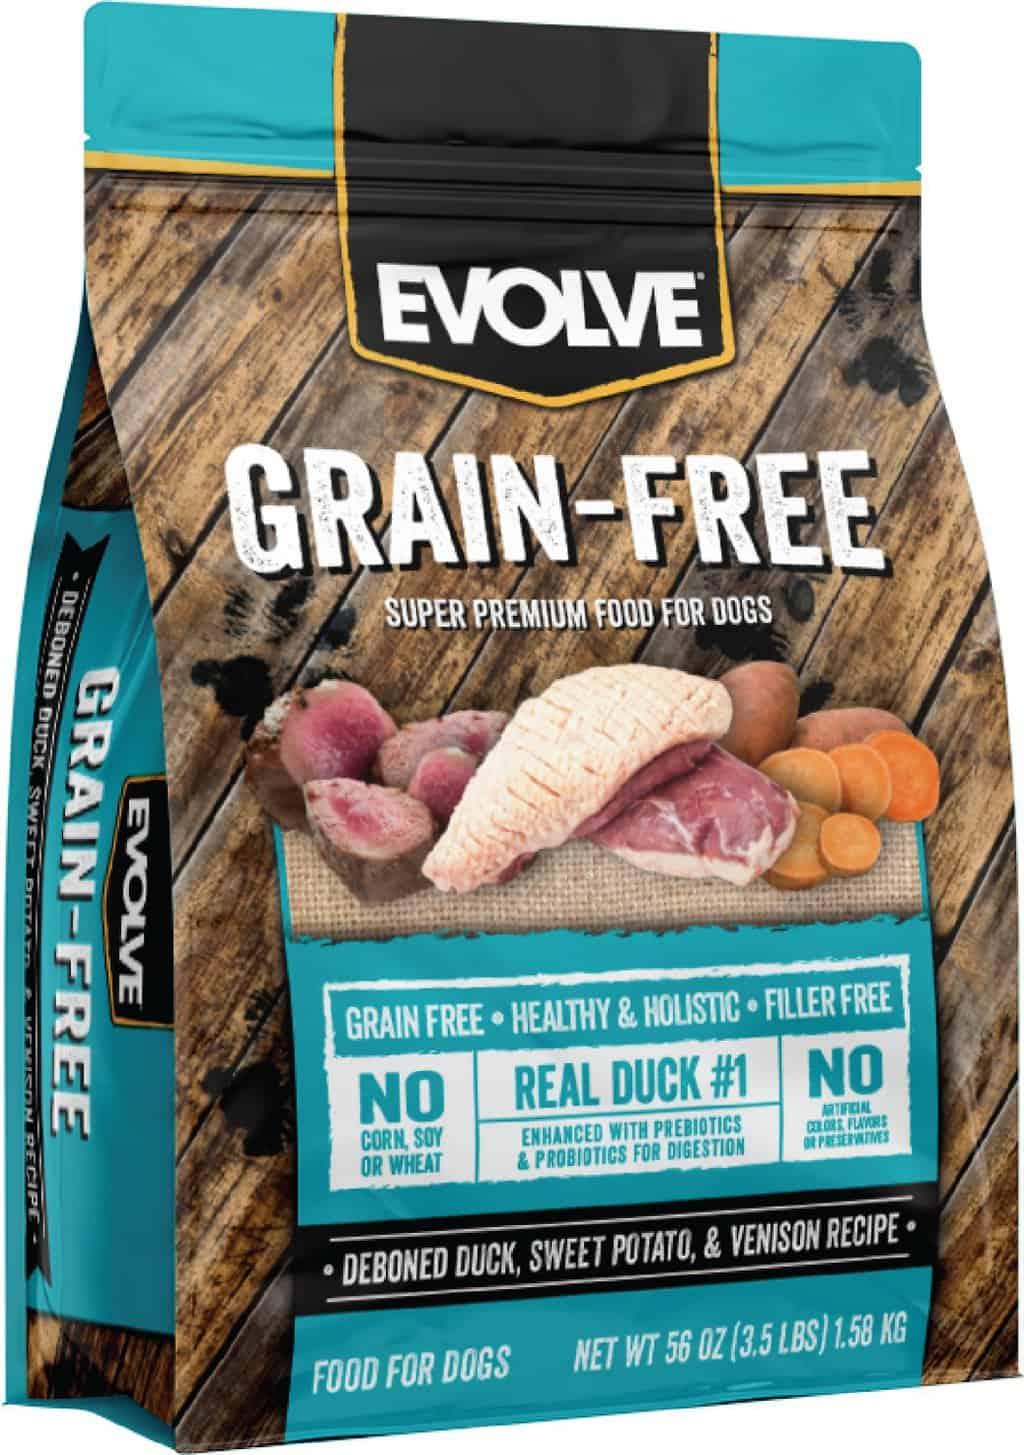 Evolve Dog Food Reviews [year]: Best Affordable, Premium Pet Food? 22